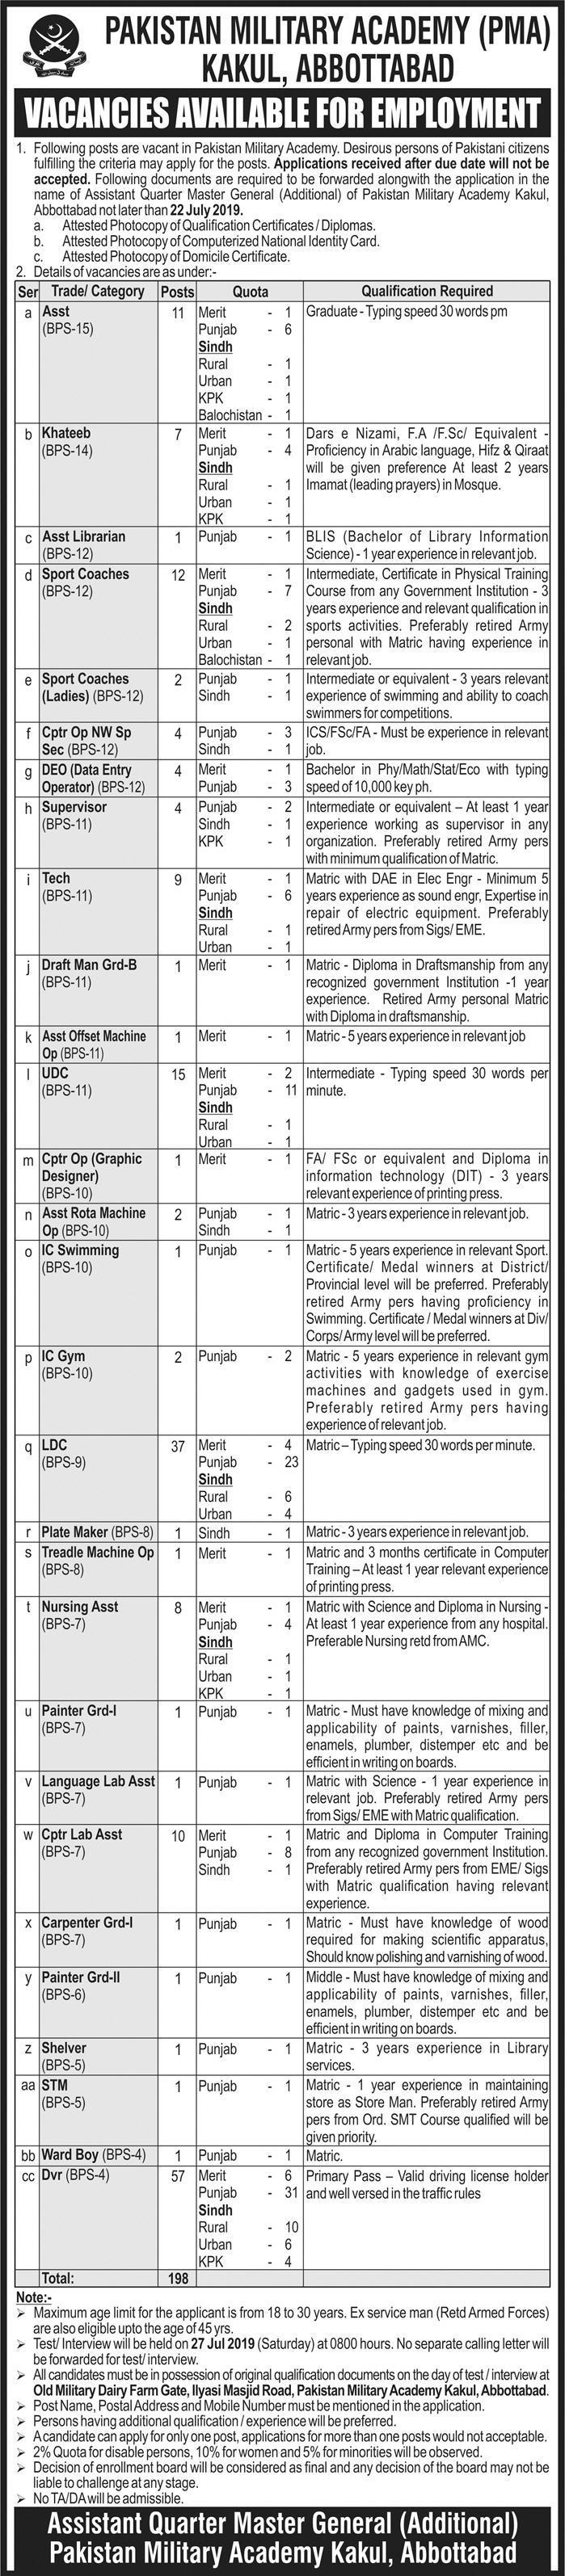 PMA Kakul Abbottabad Jobs 2019 Pakistan Military Academy Latest Vacancies